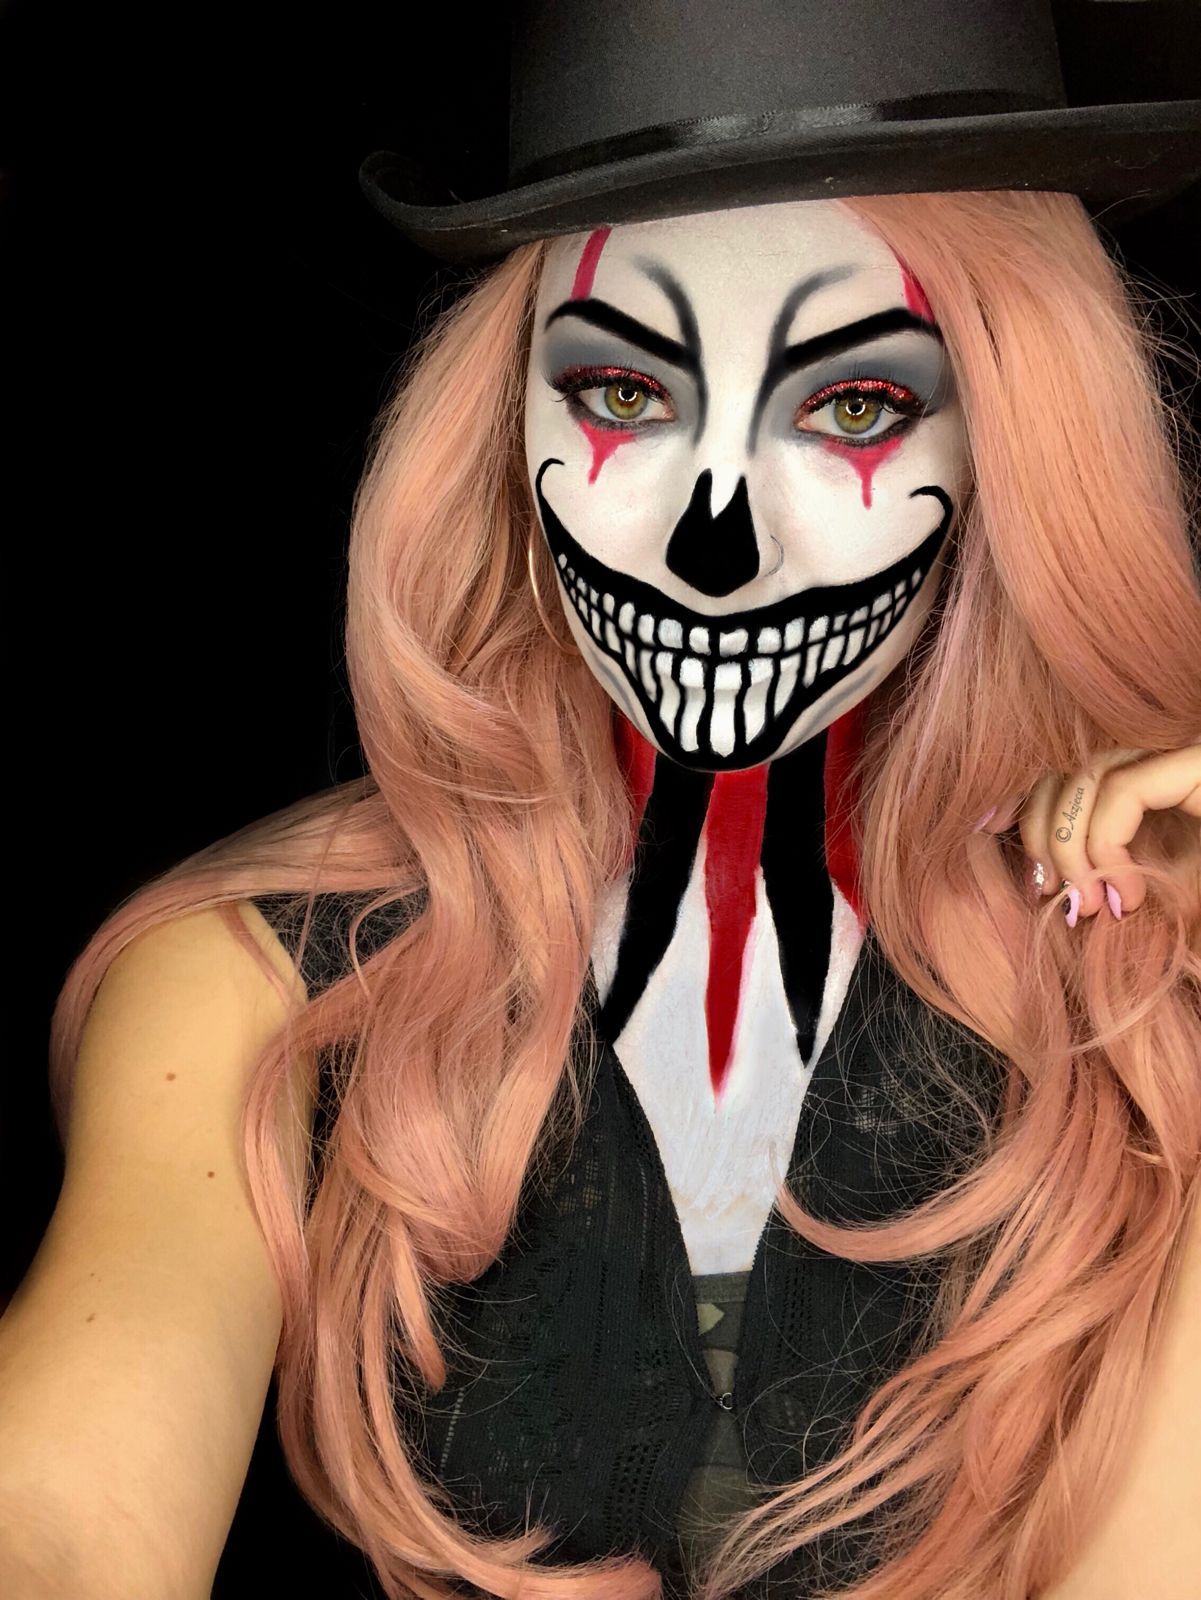 Halloween Schminke Bilder.Ringmaster By Aszjeca Burden Schminken Halloween Halloween Make Up Hexe Schminkgesichter